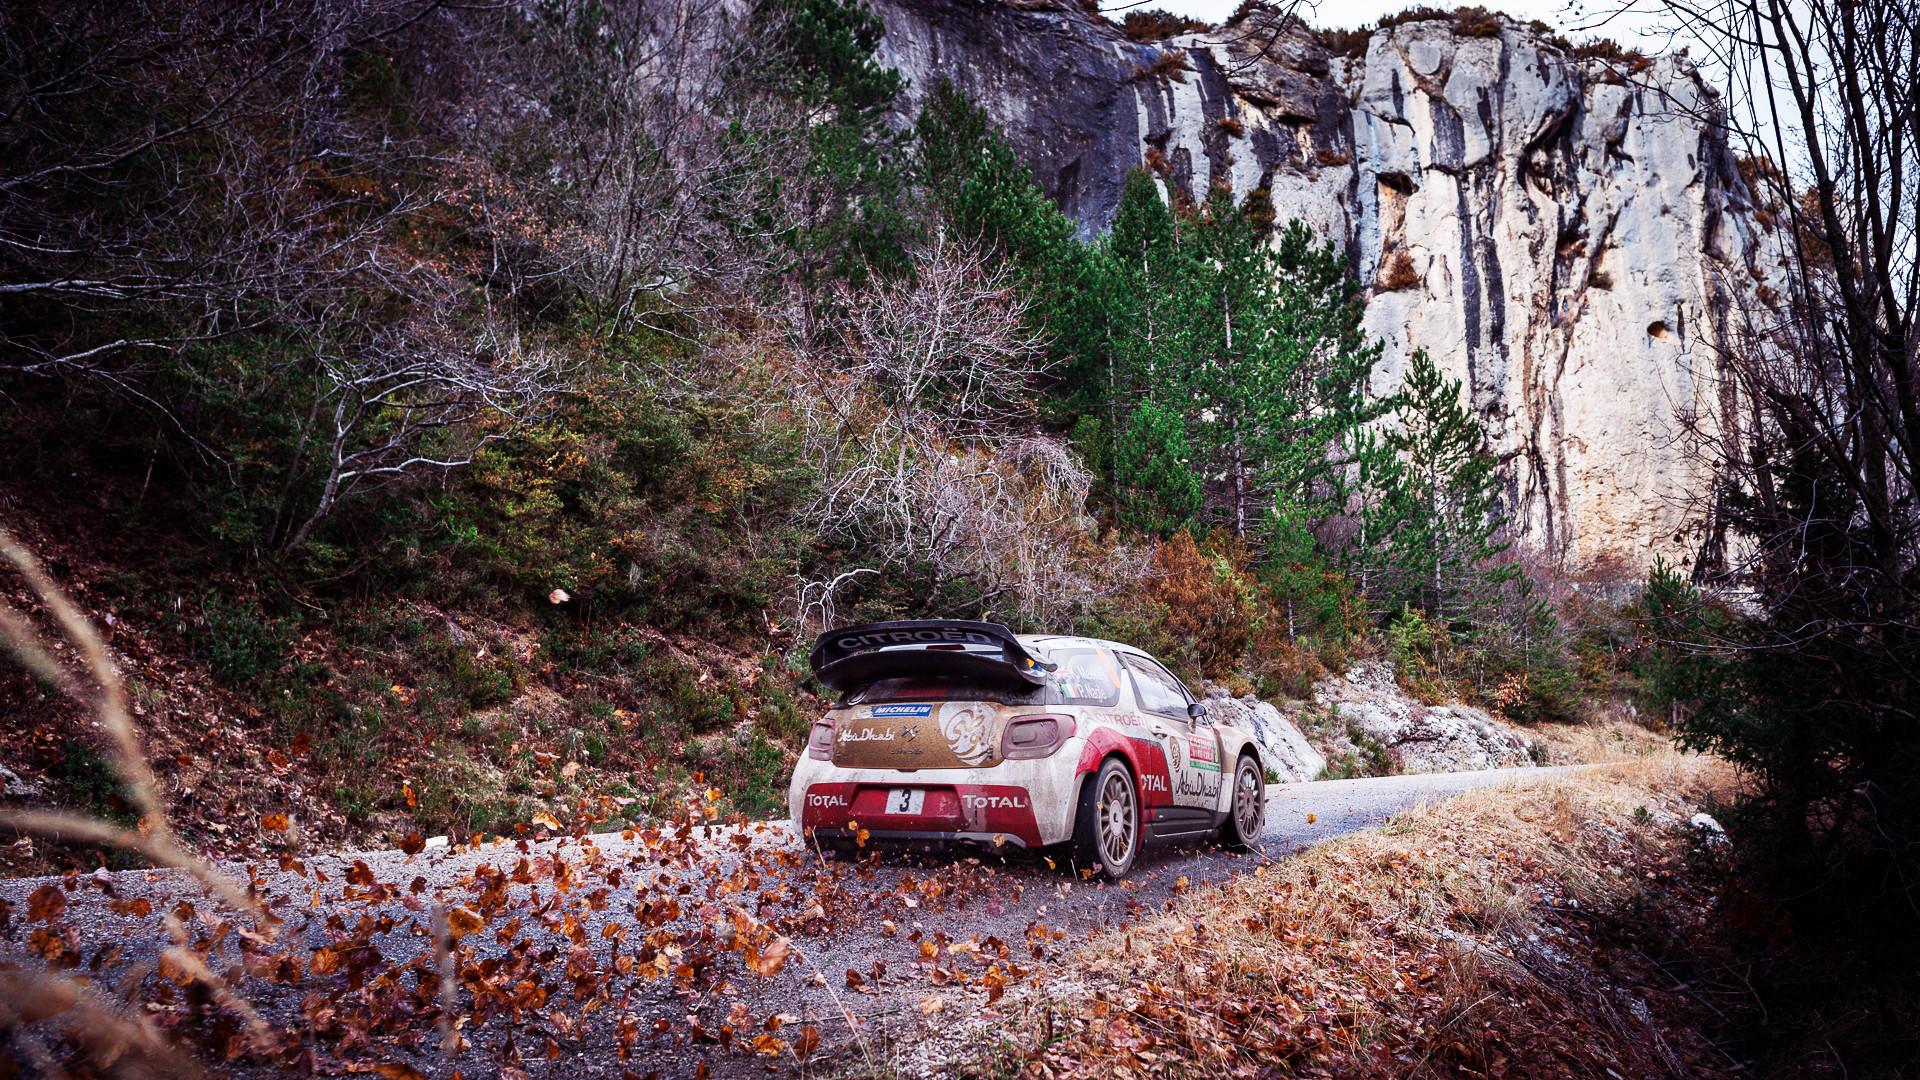 … citroen ds3 autumn stickers falling leaves mountain liftback italy …